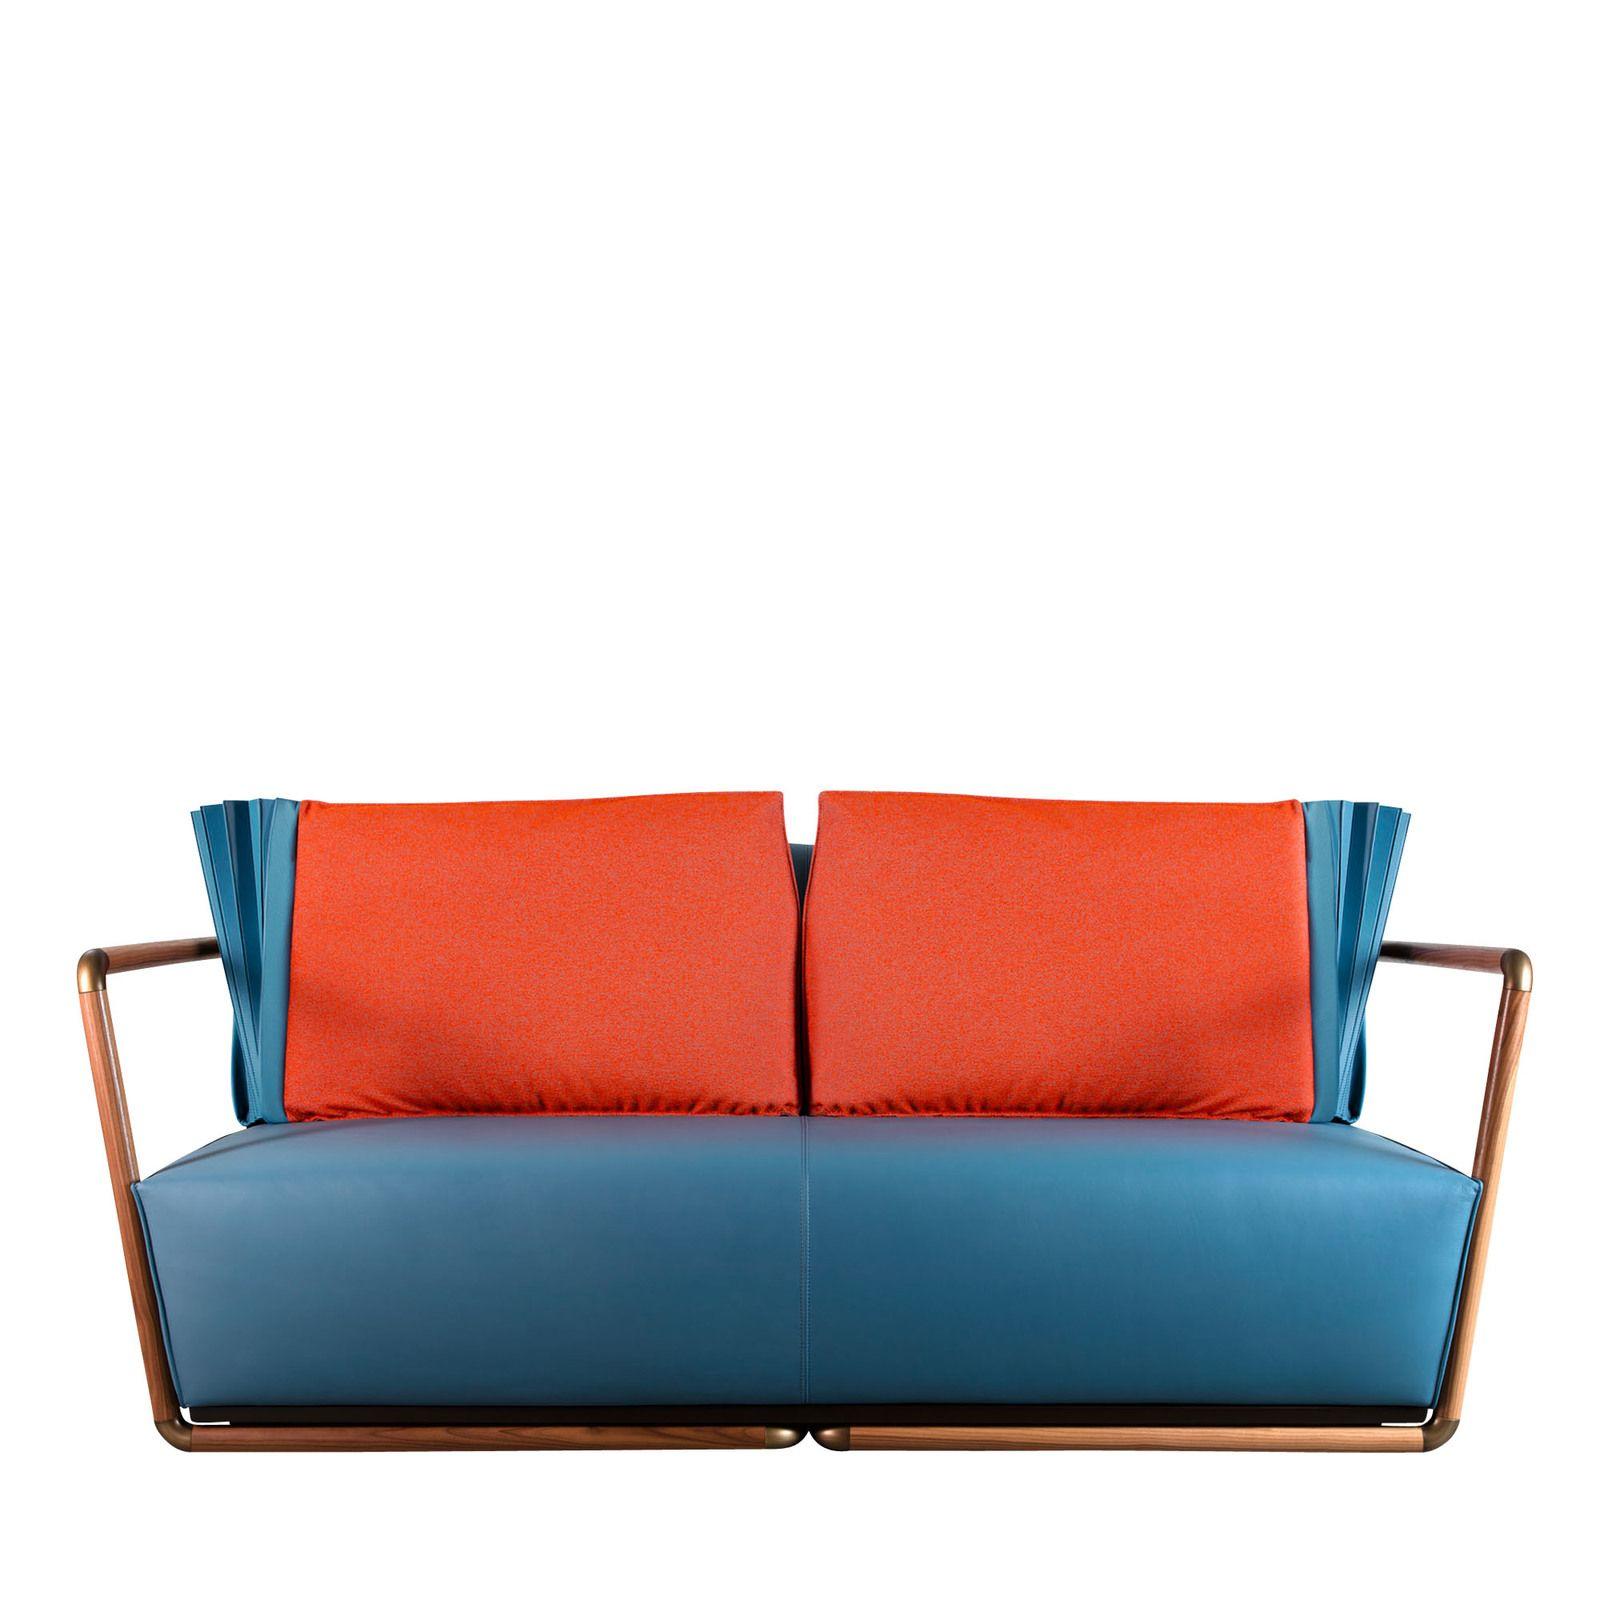 Blu Niagara Sofa By Selene Tunesi Shop Adele C Online At Artemest Italian Furniture Italian Leather Sofa Luxury Italian Furniture